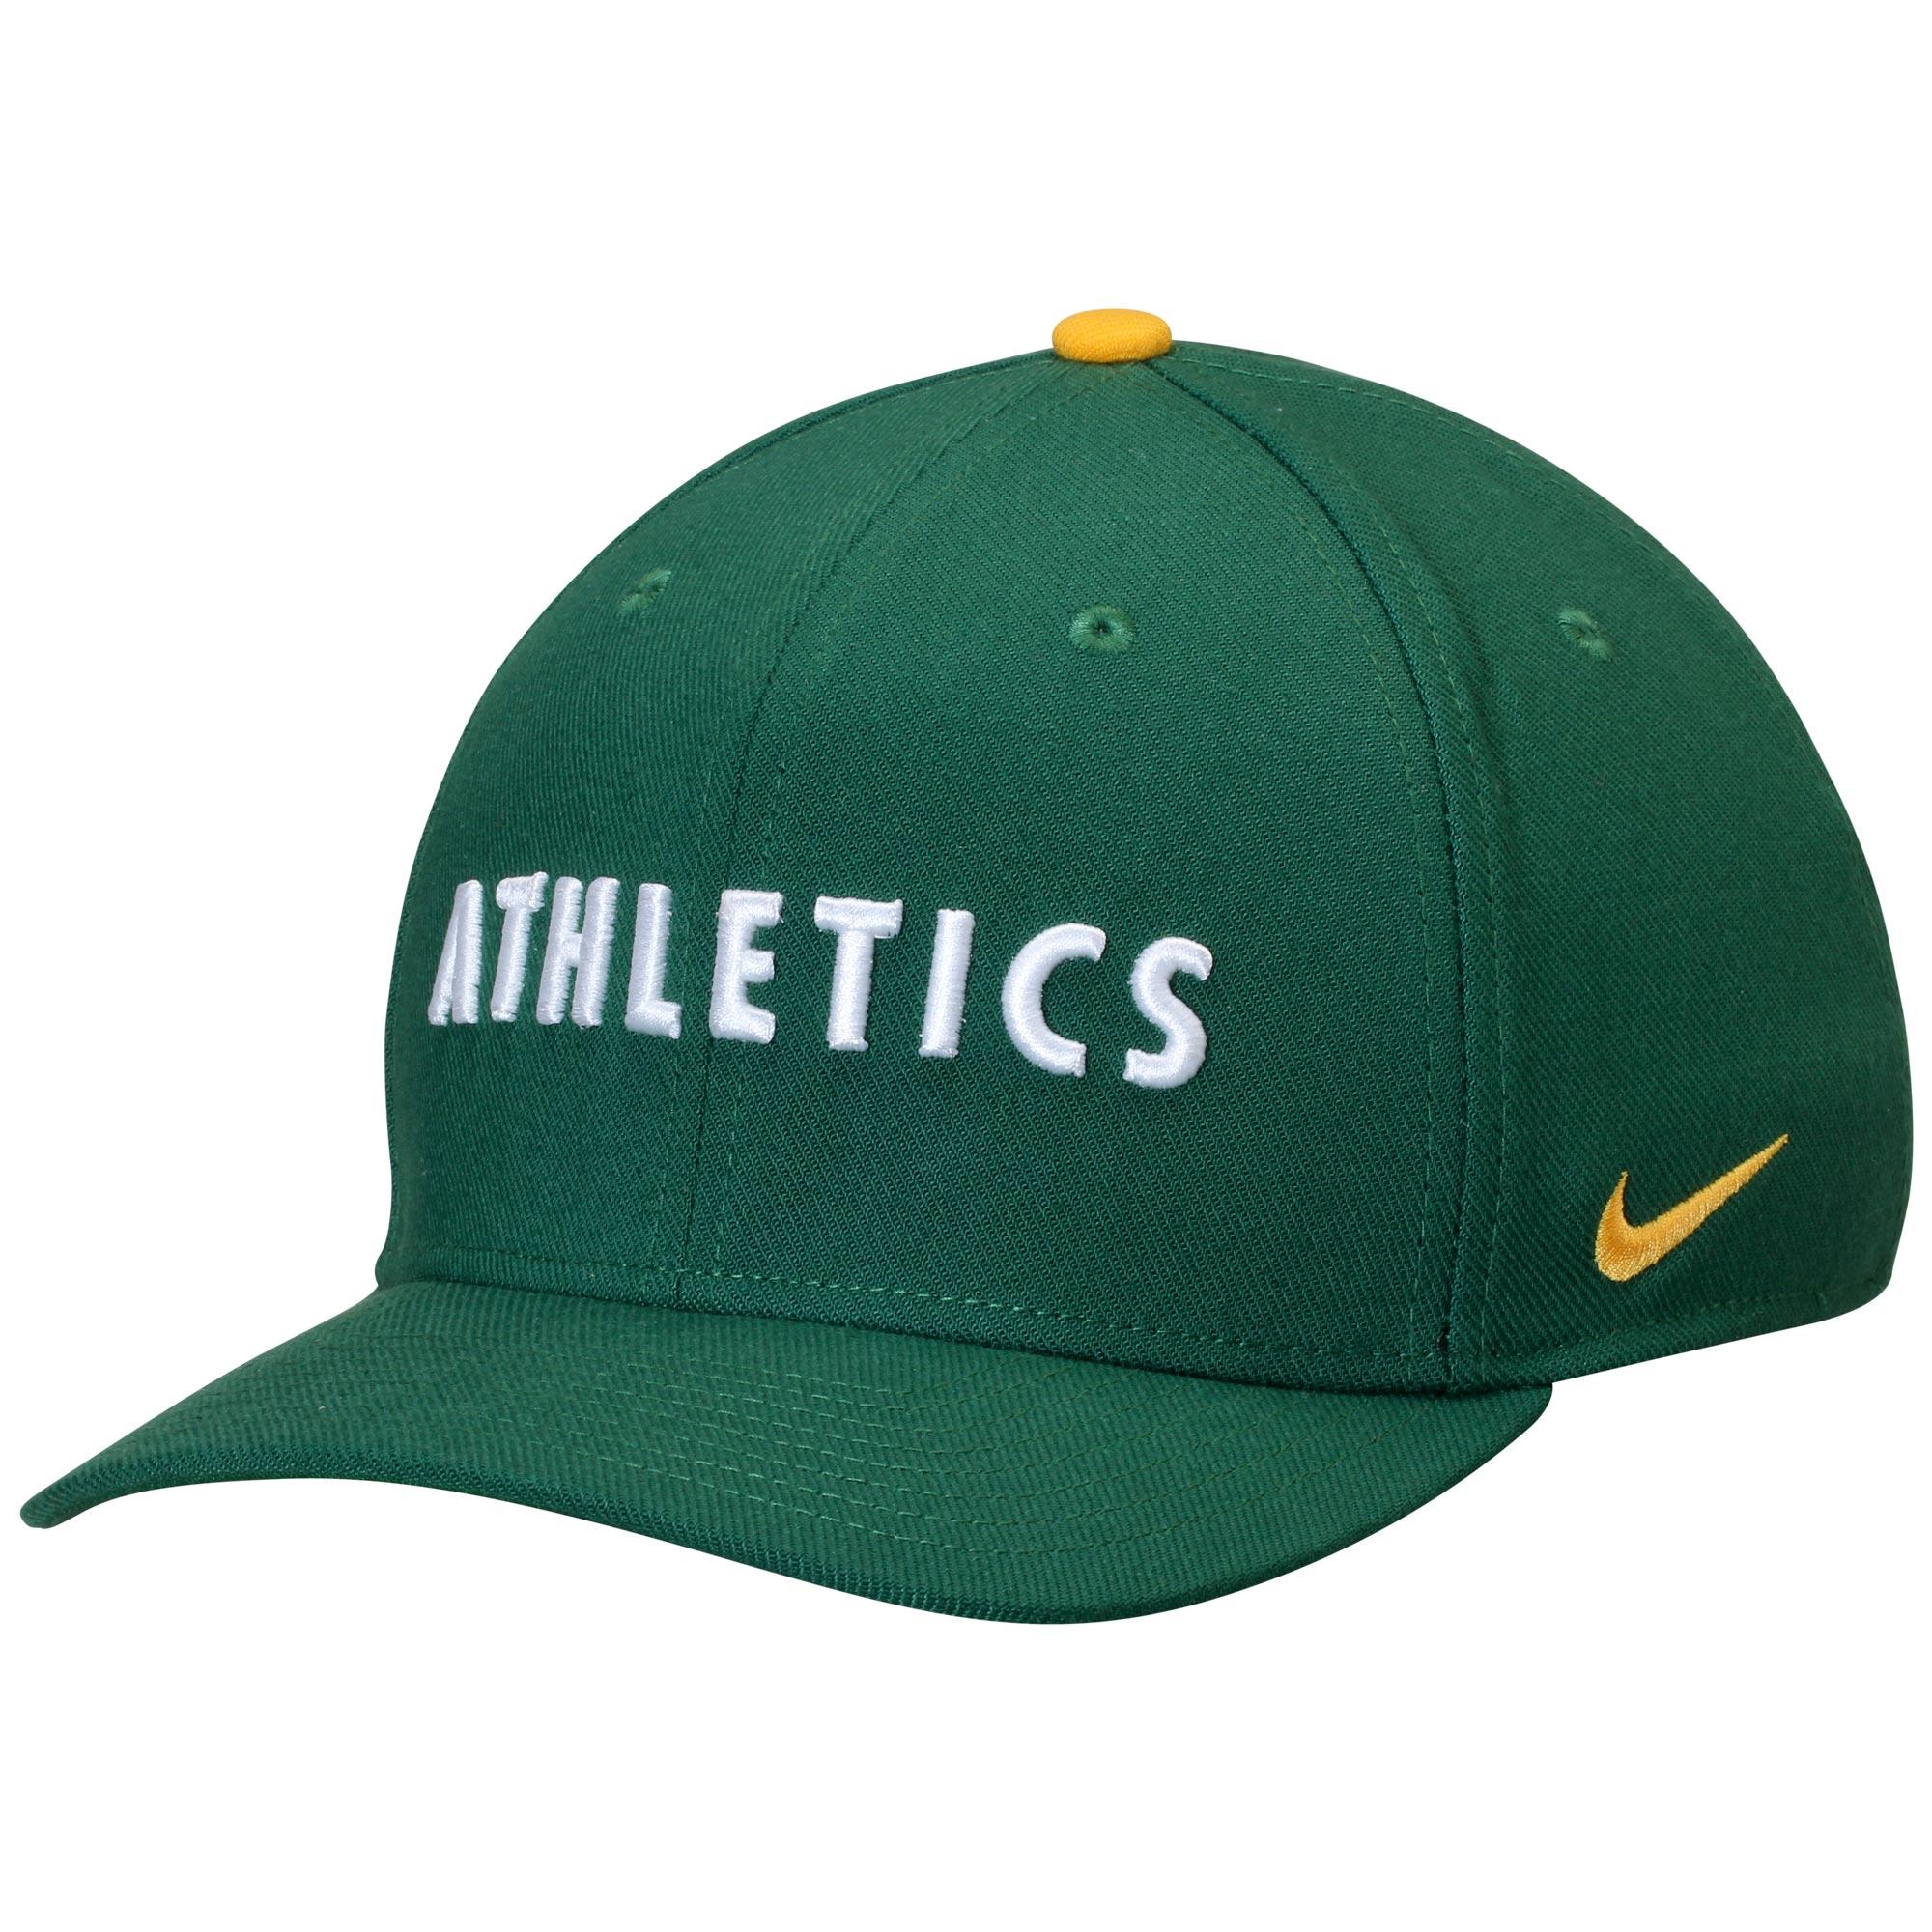 Oakland Athletics Nike Classic Swoosh Performance Flex Hat - Green